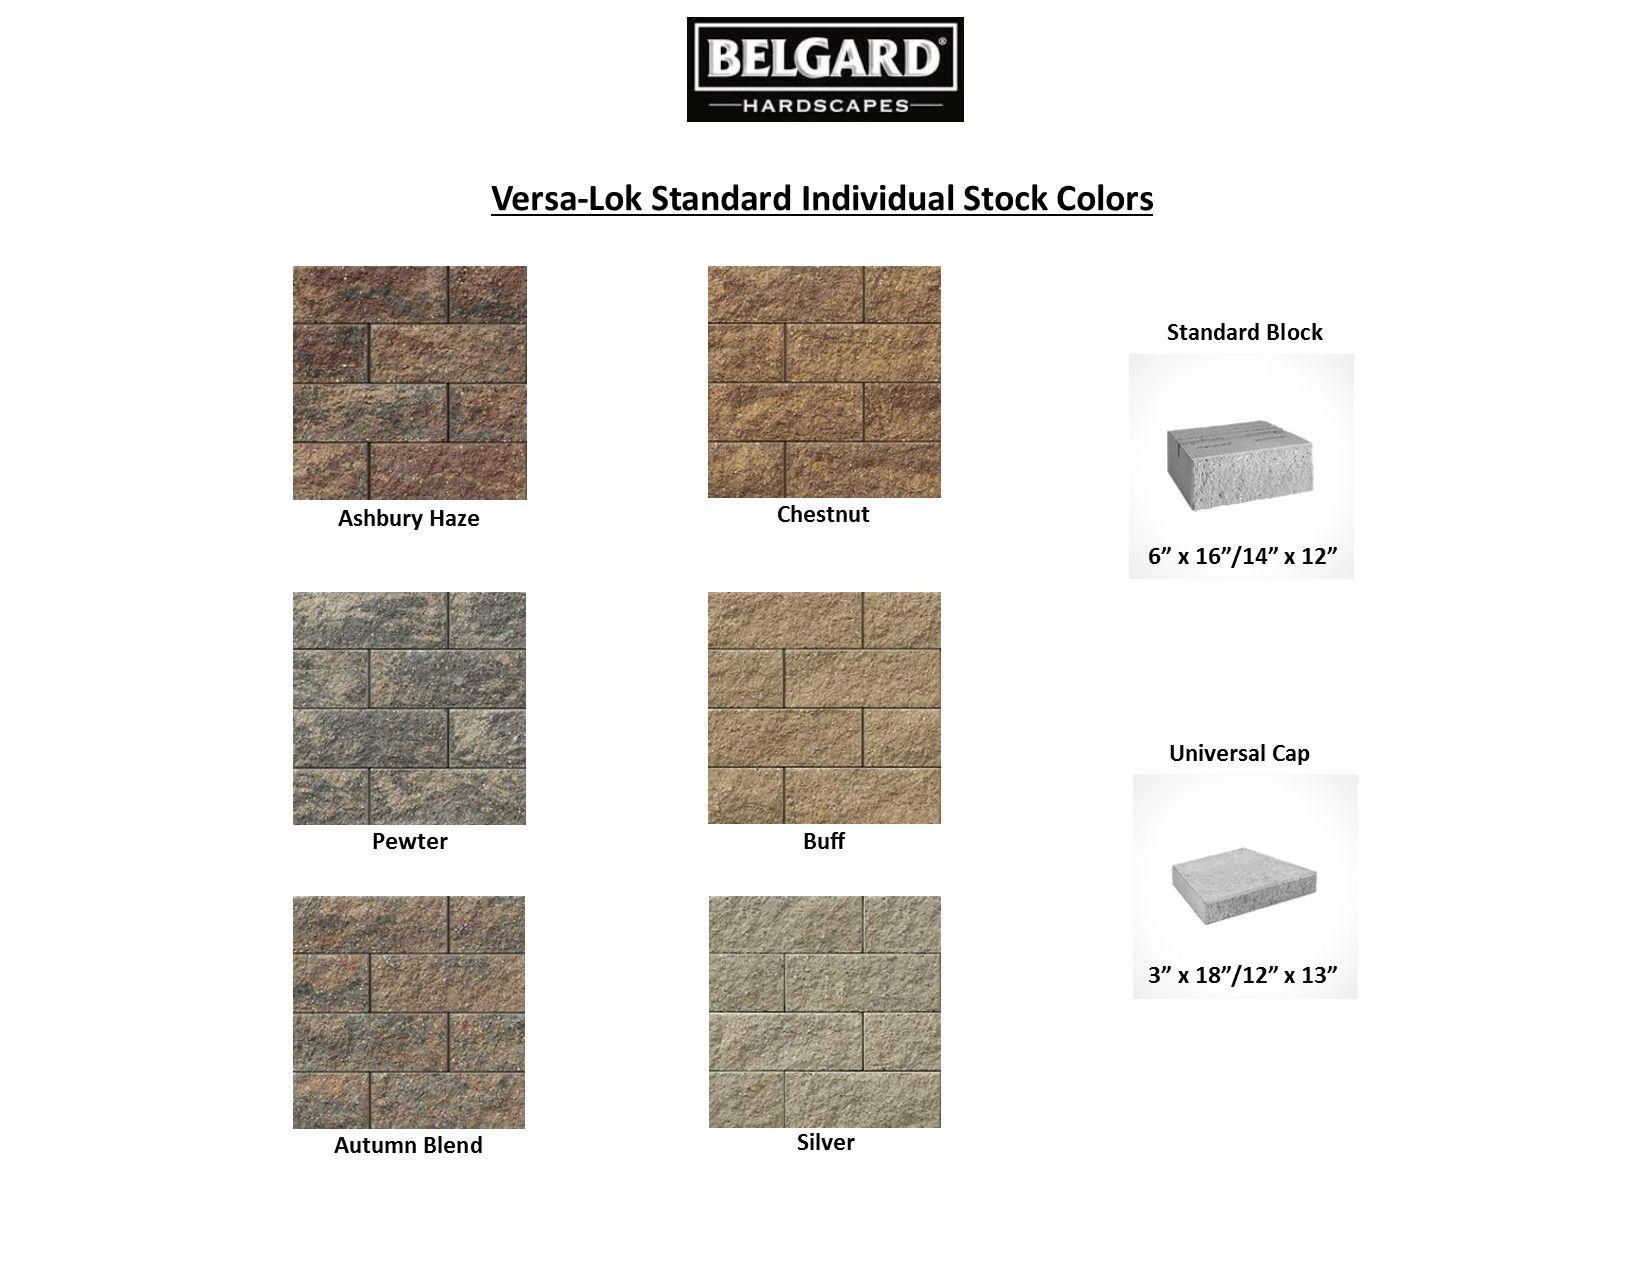 Belgard Versa Lok Champion Brick Stock Colors Landscape Design Hardscape Belgard Hardscapes